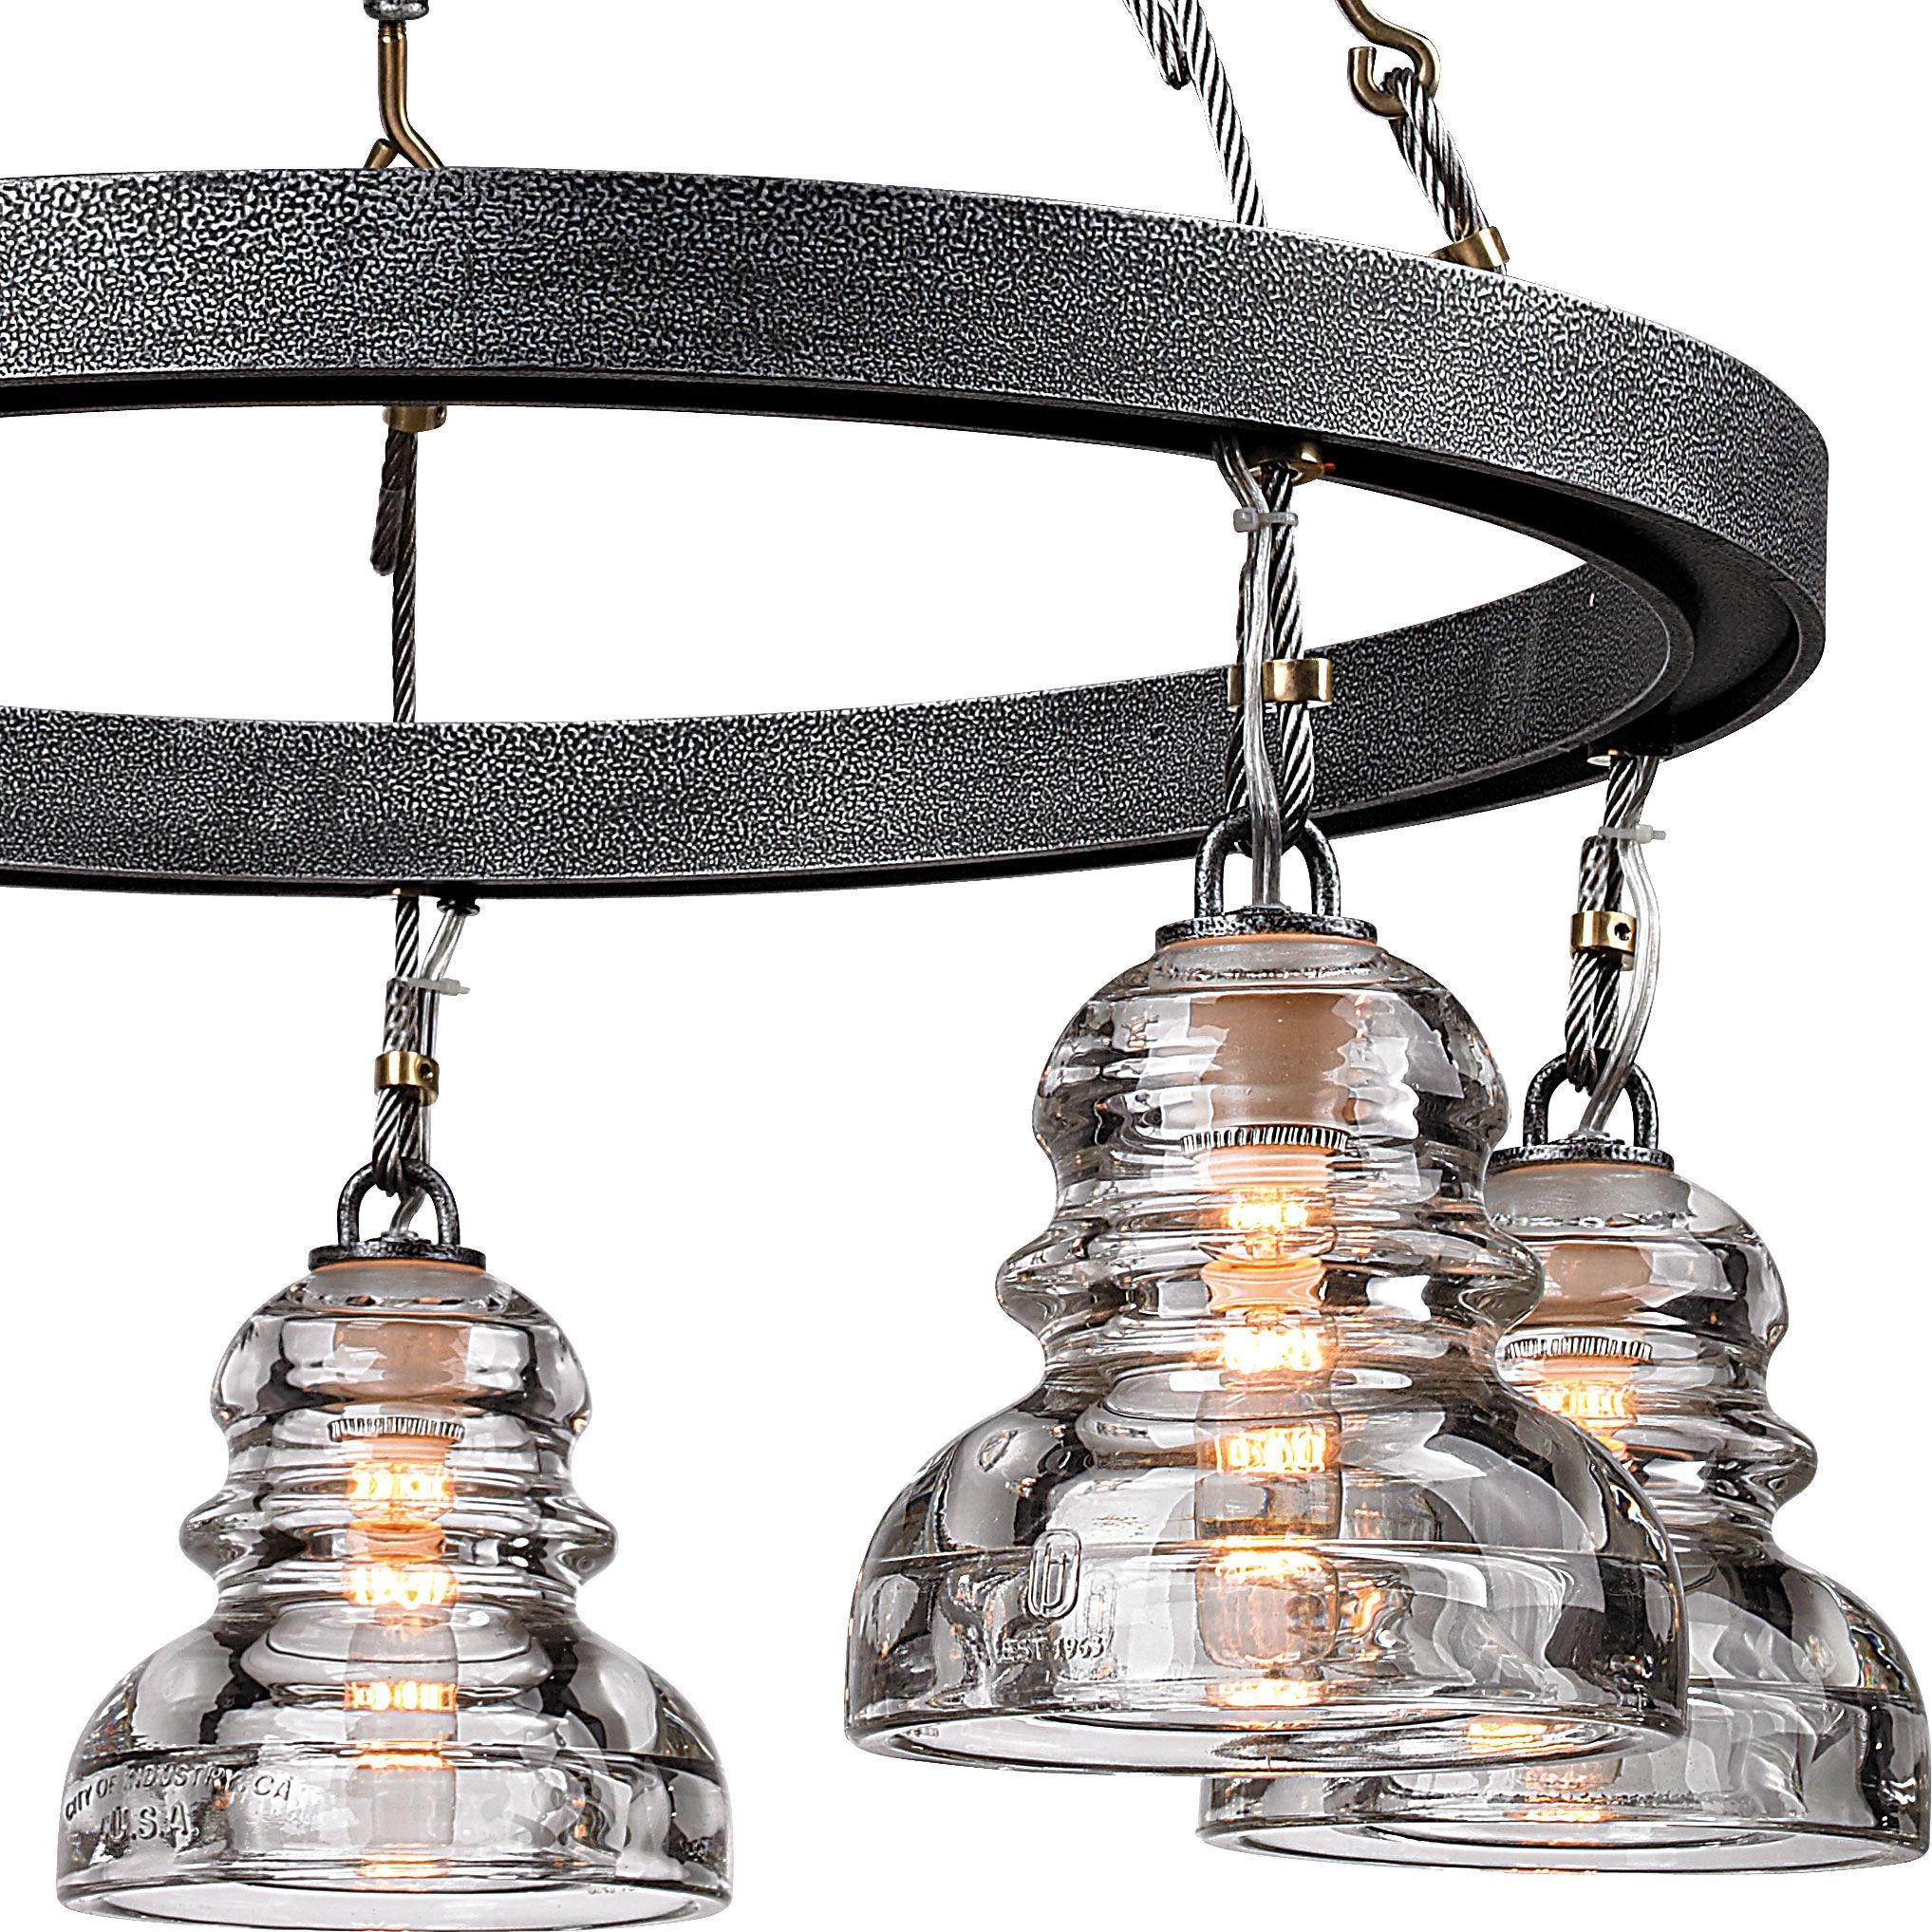 Troy Lighting F3135 Old Silver Menlo Park 5 Light Chandelier With Glass Insulator Shades Lightingdirect Com